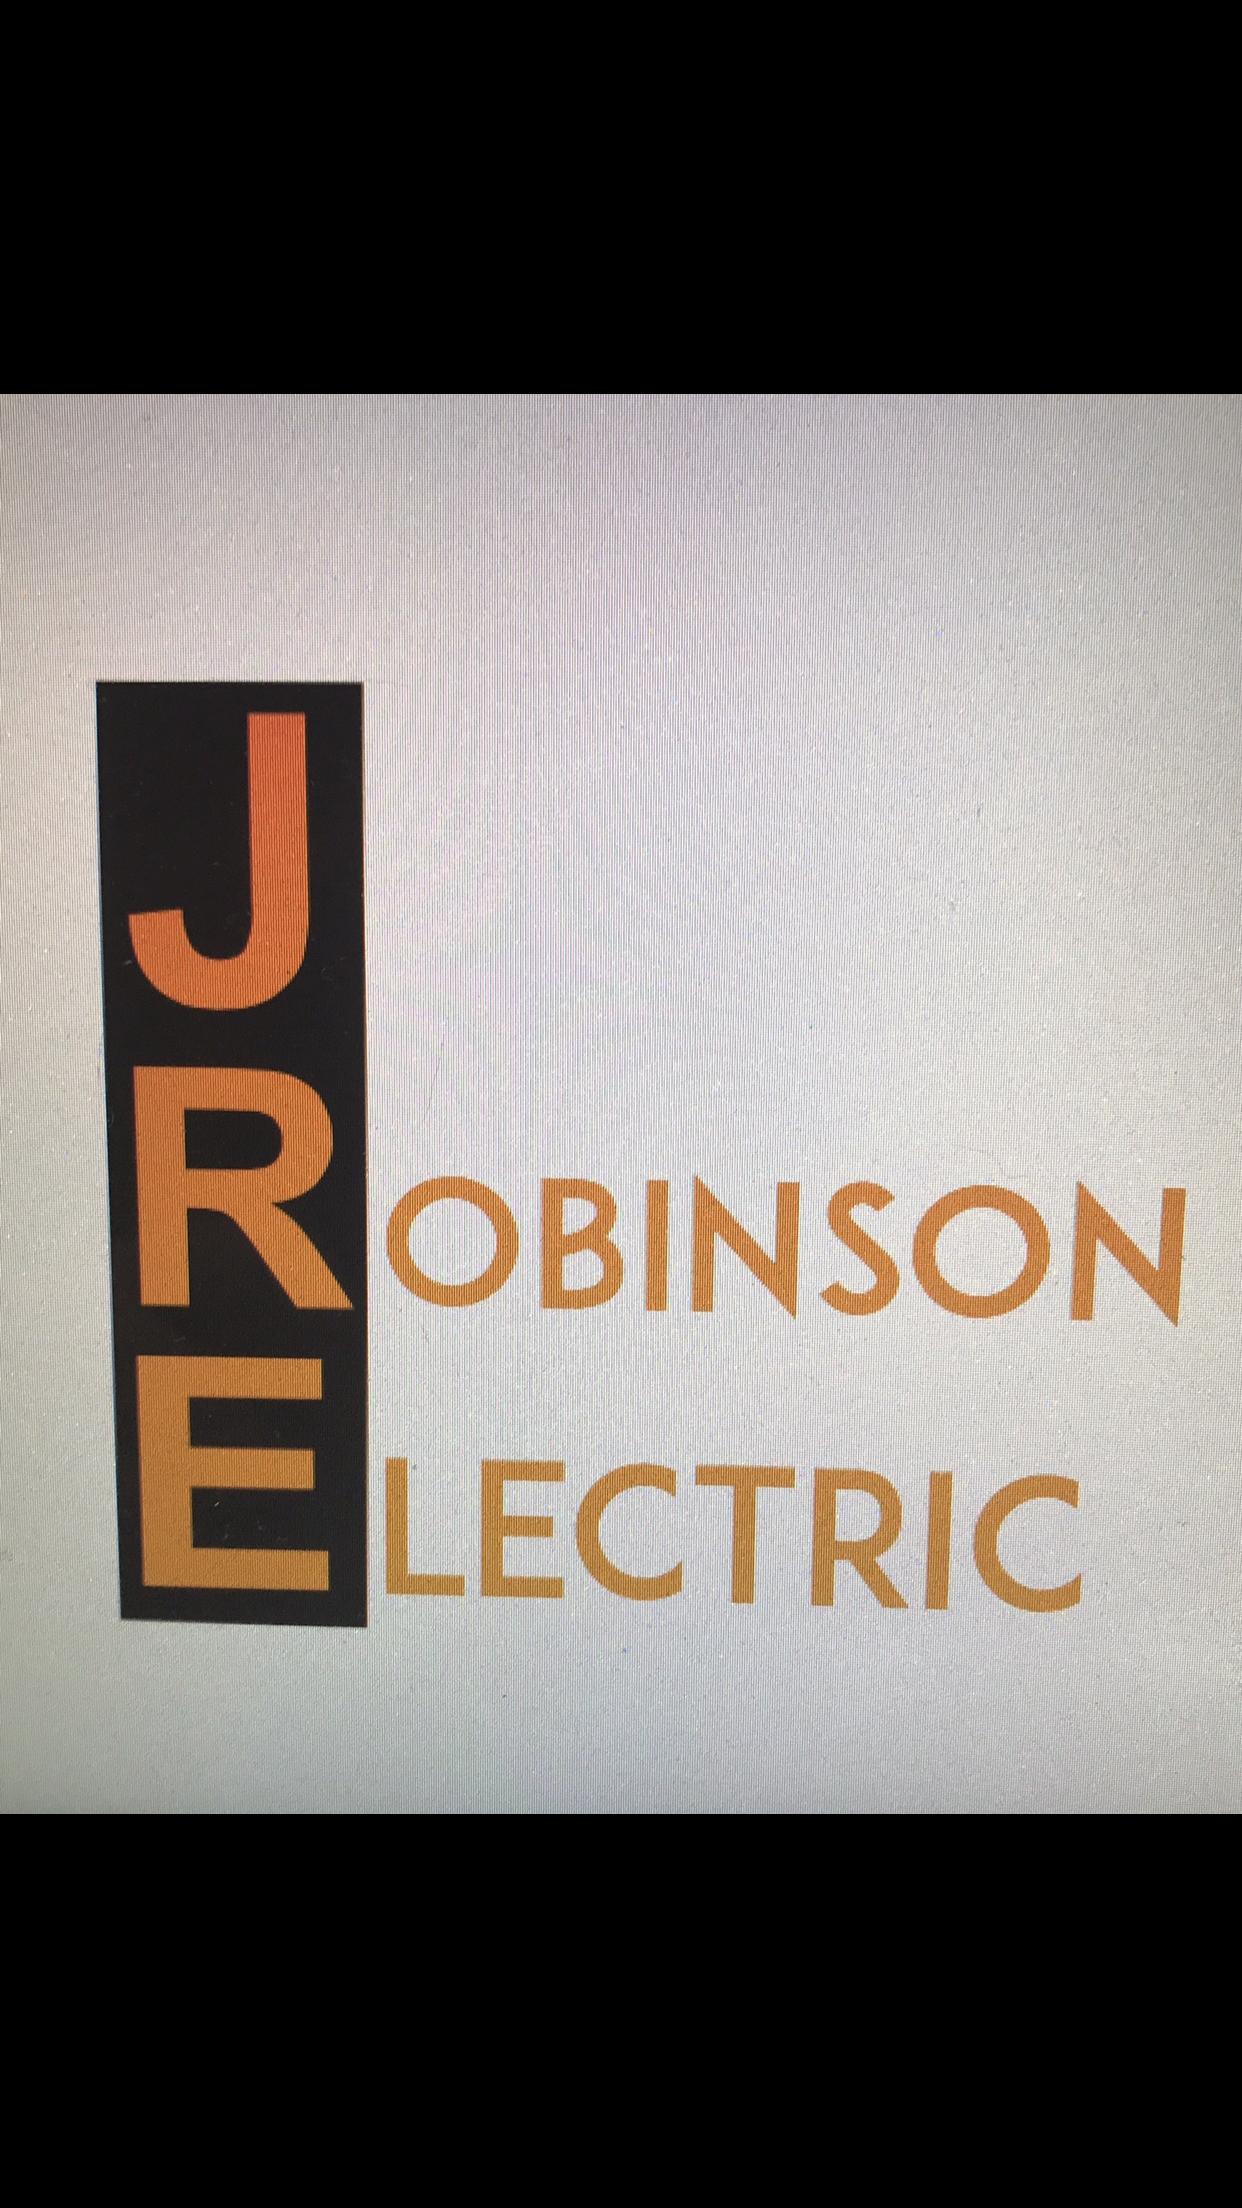 J Robinson Electric Business Logo